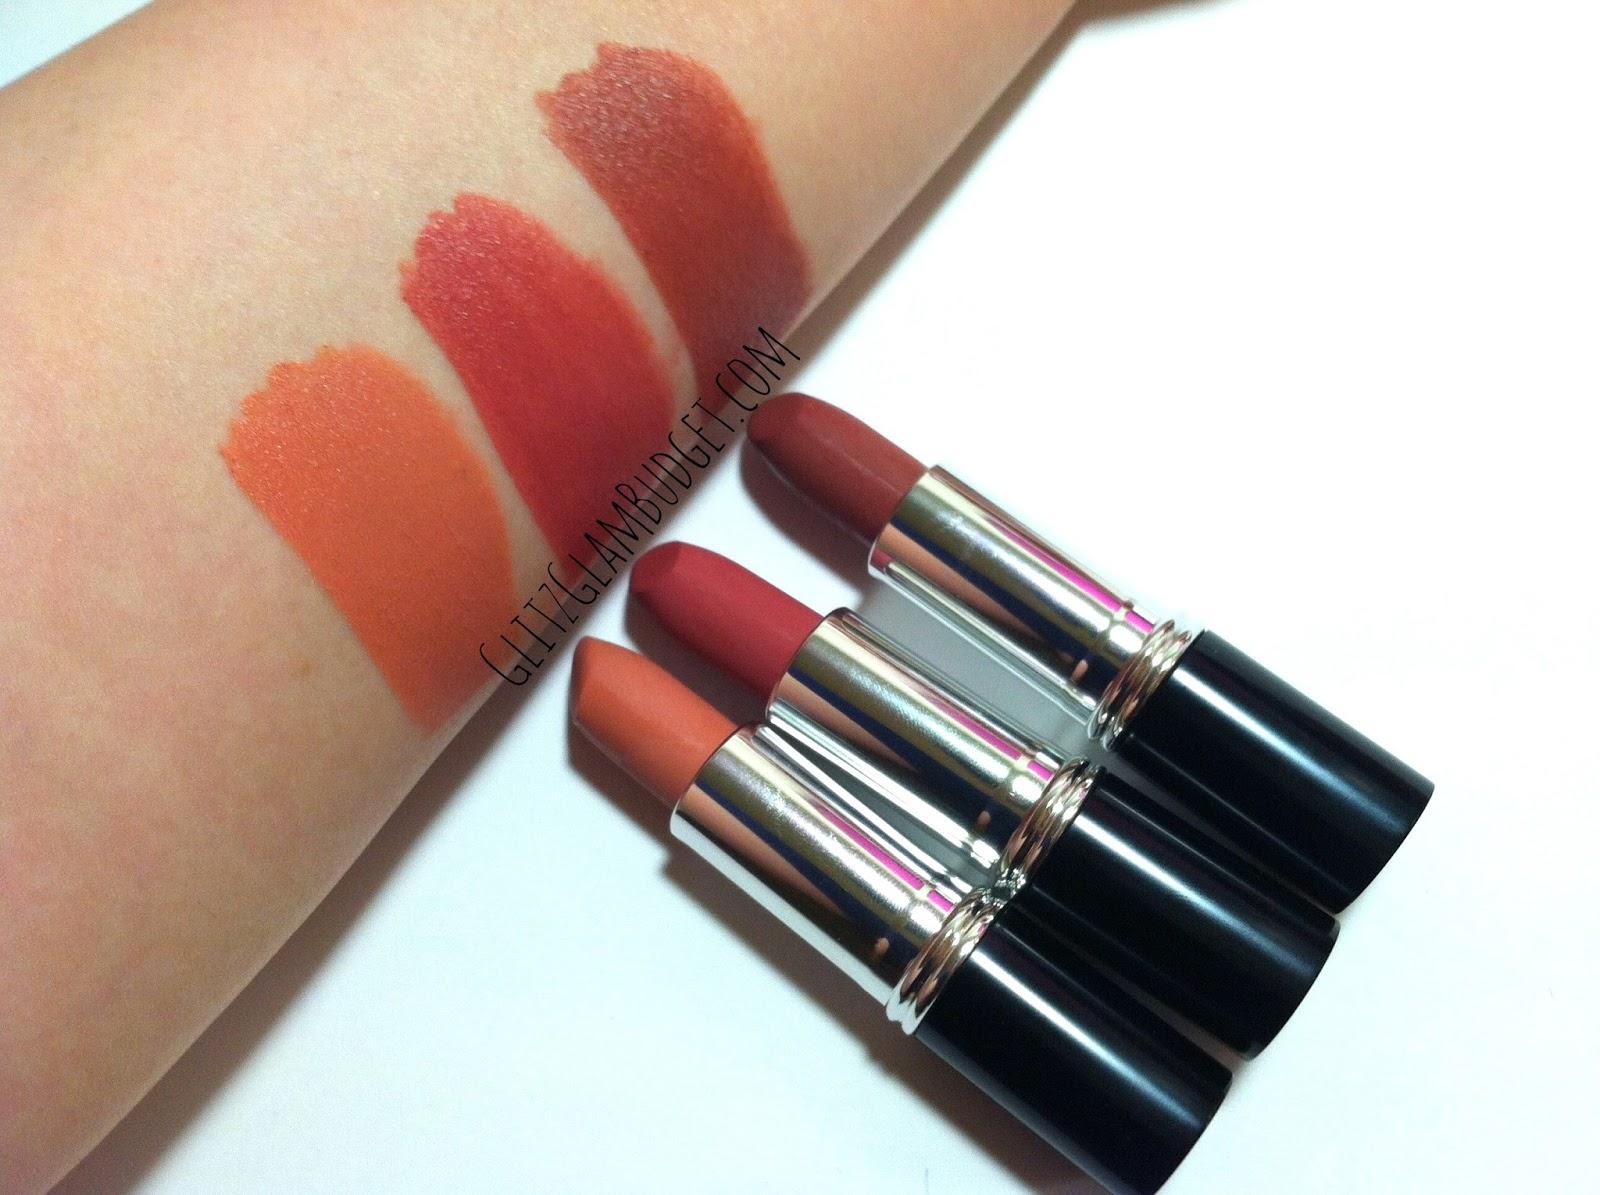 Laura Geller Creme Couture Soft Touch Matte Lipsticks Swatches